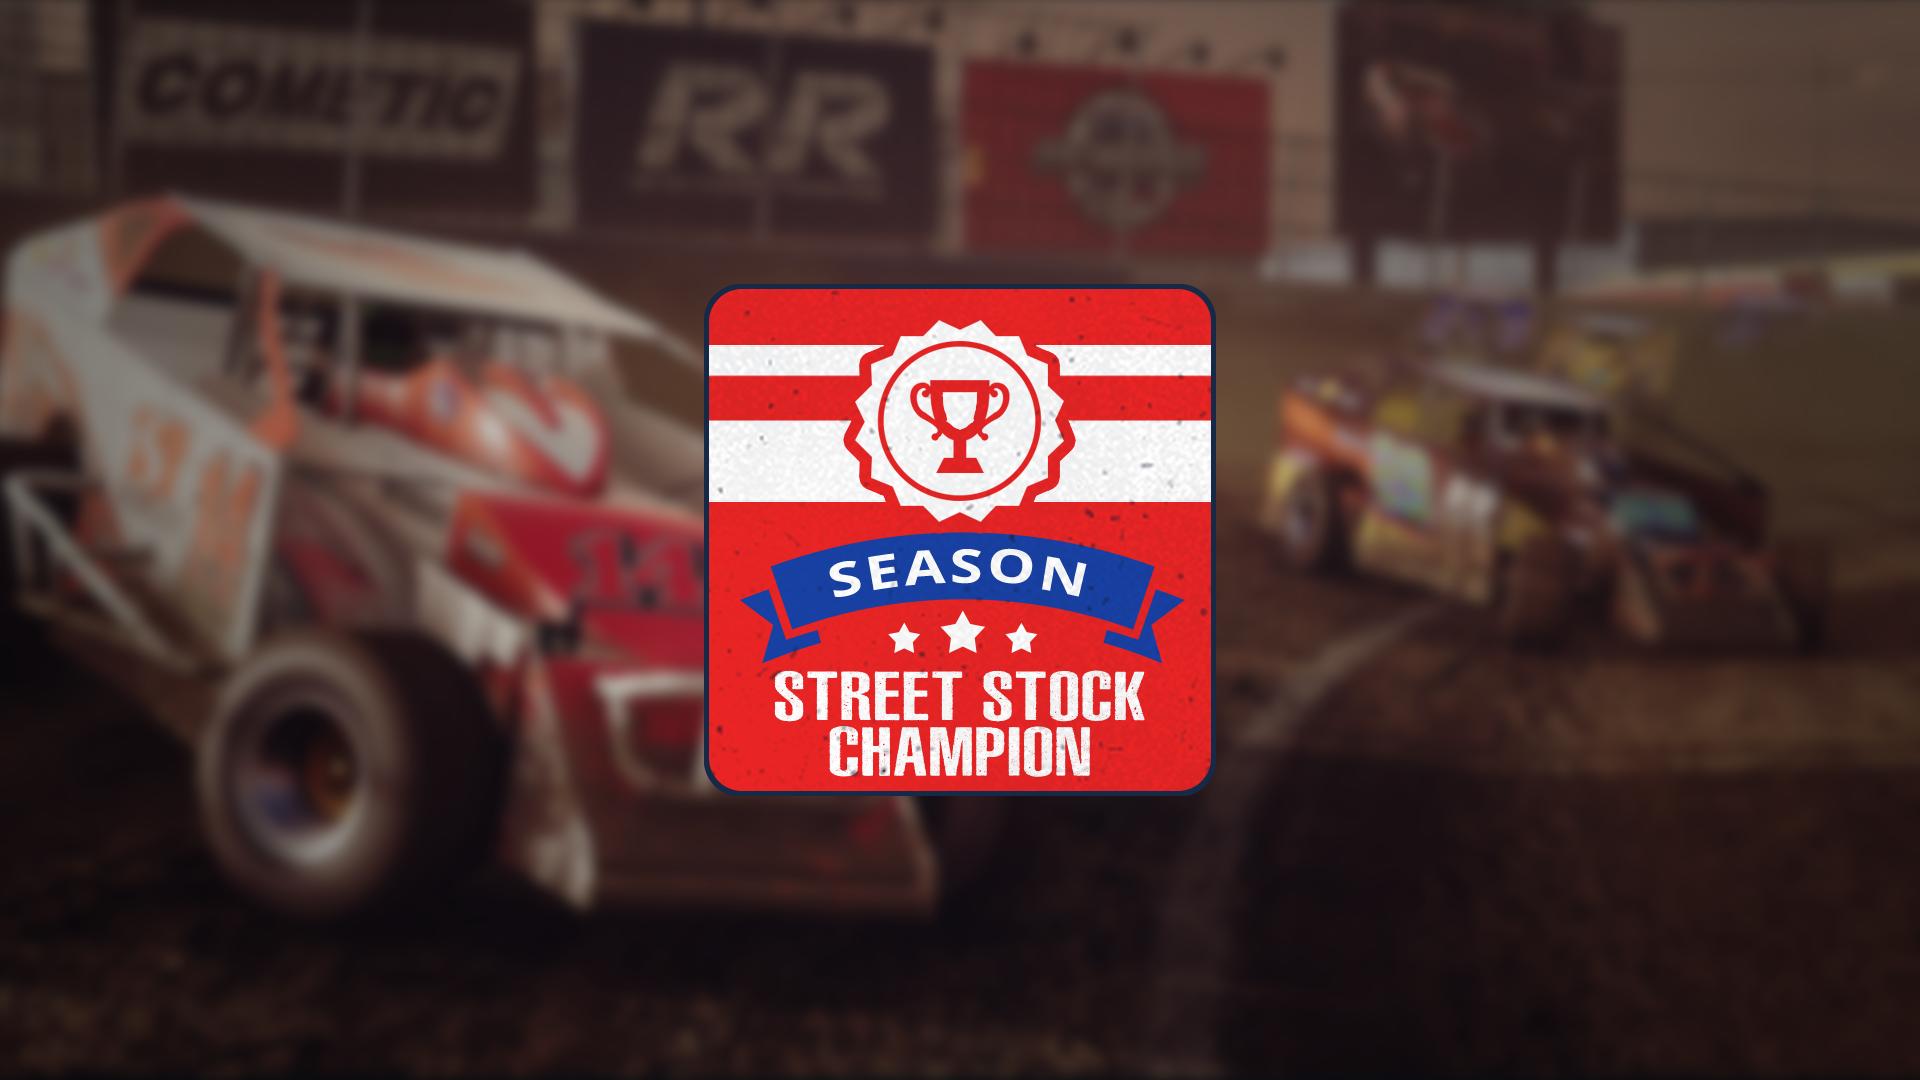 Street Stock Champion